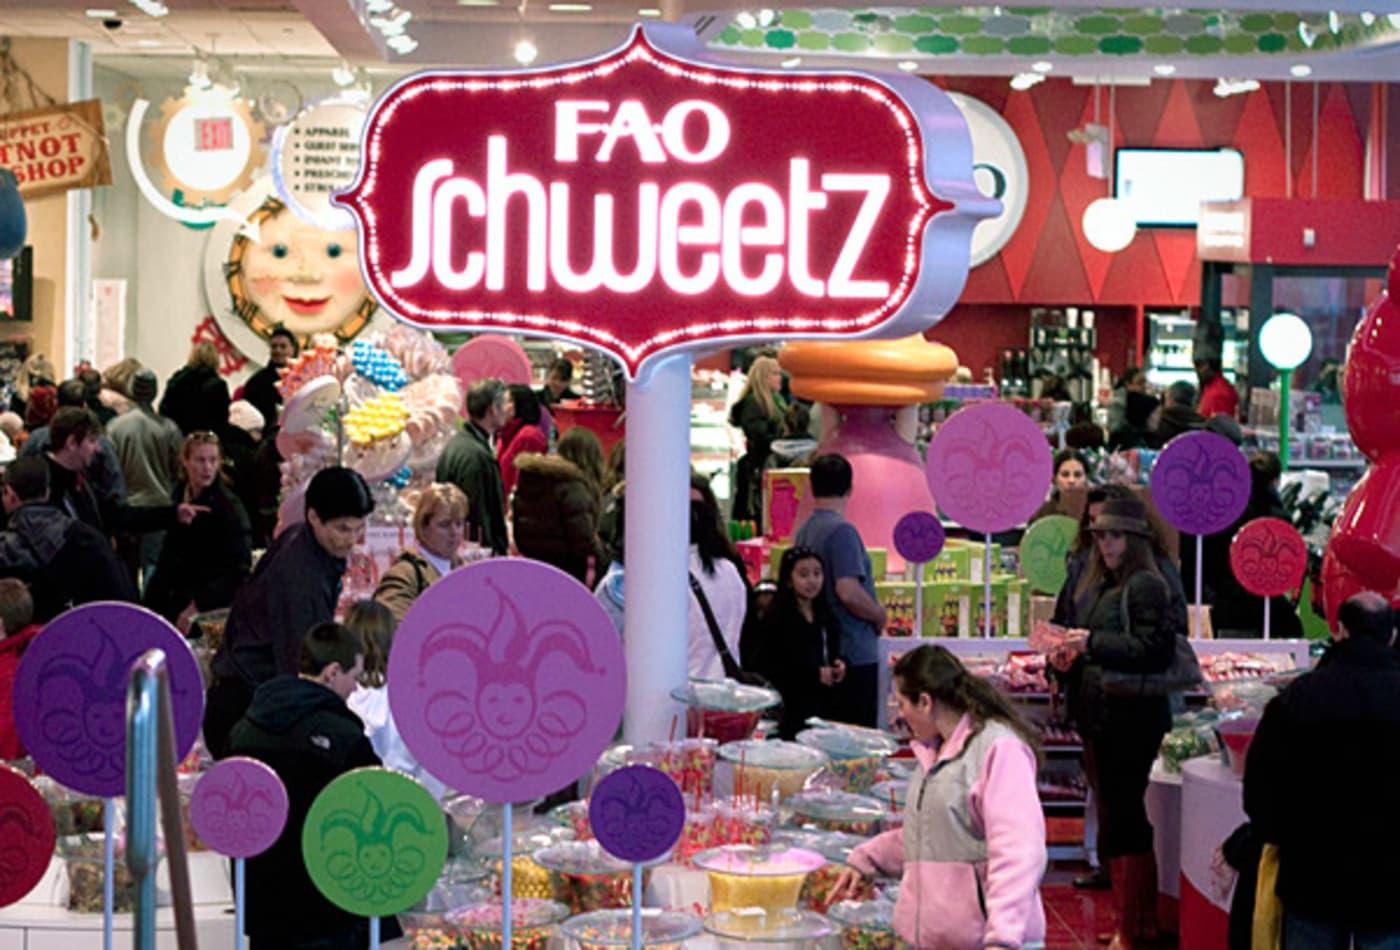 CNBC-FAO-toys-Schweets.jpg